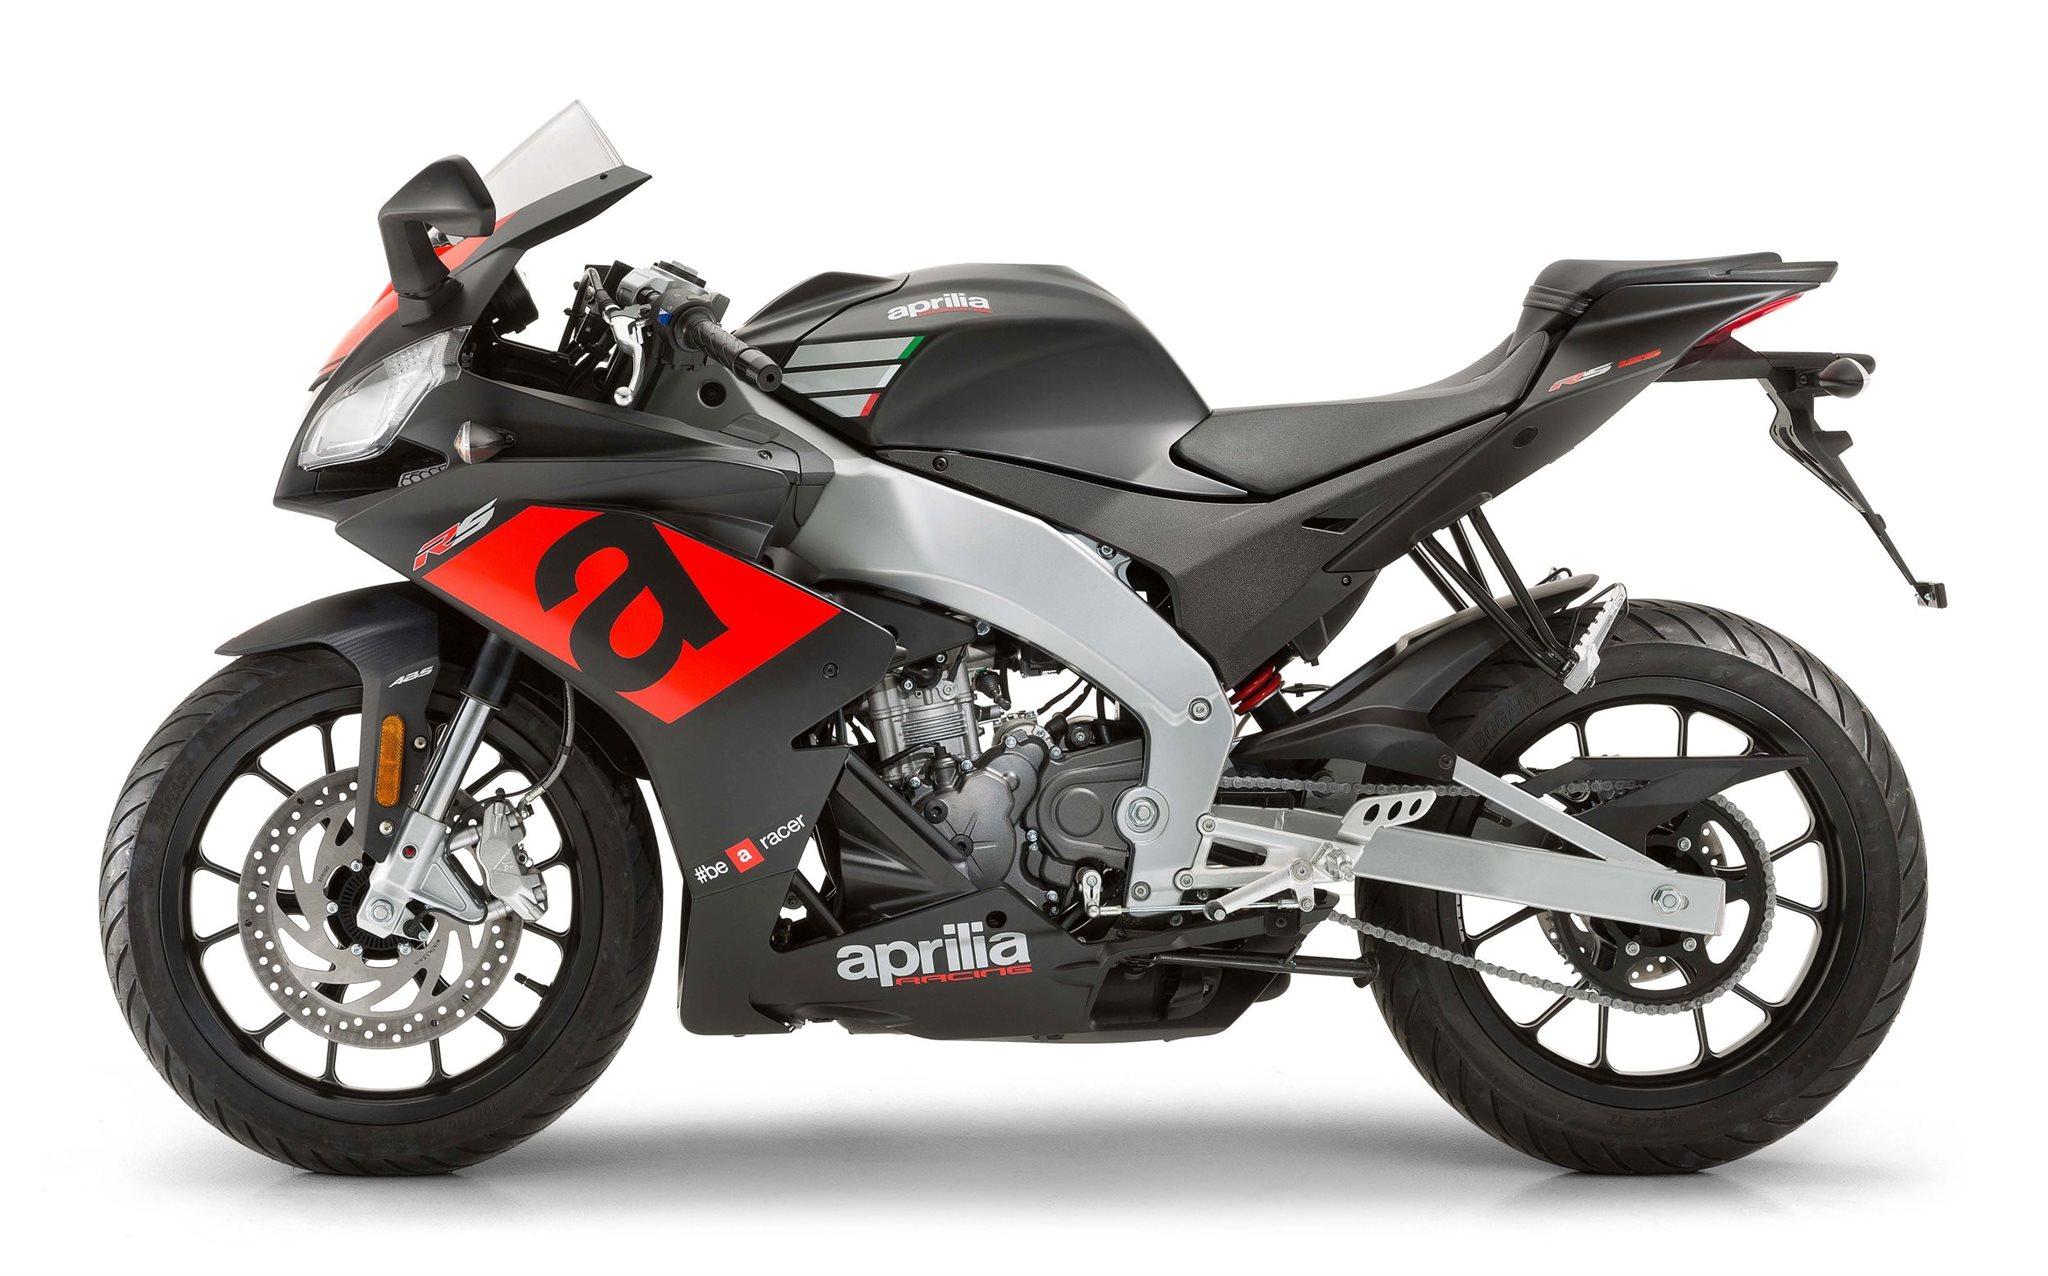 Aprilia RS 125 ABS Motorrad, neu